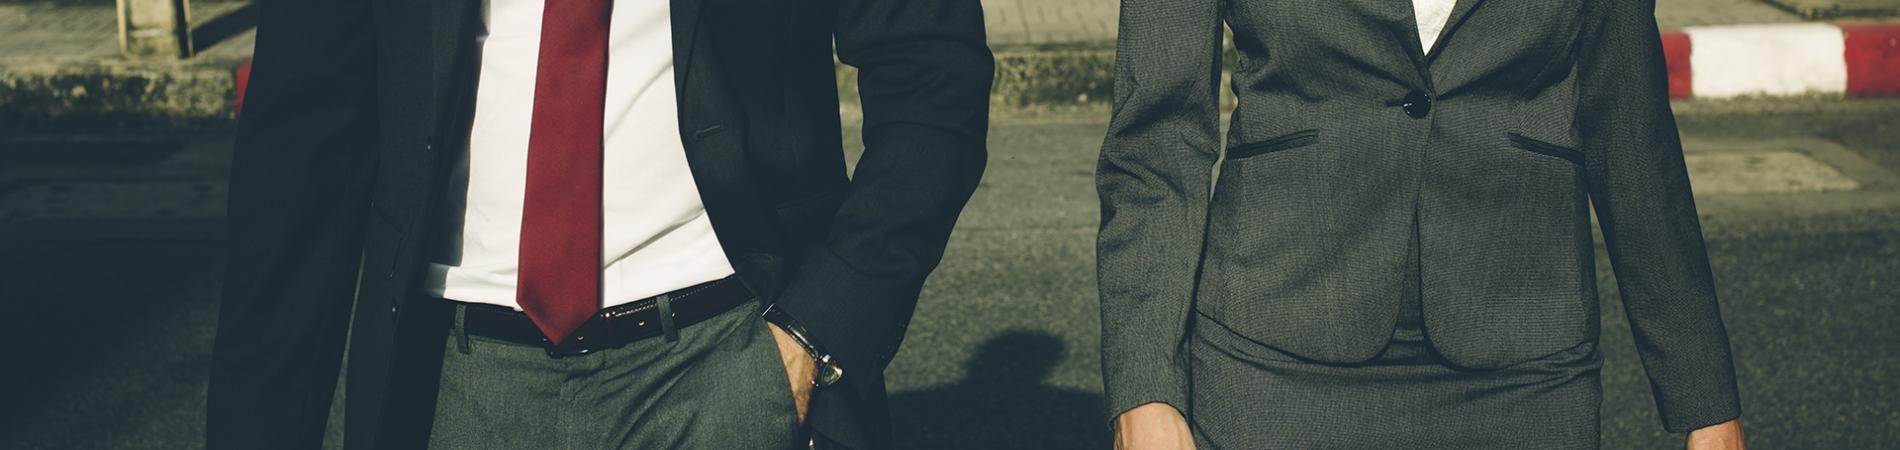 Partners - BrightContact